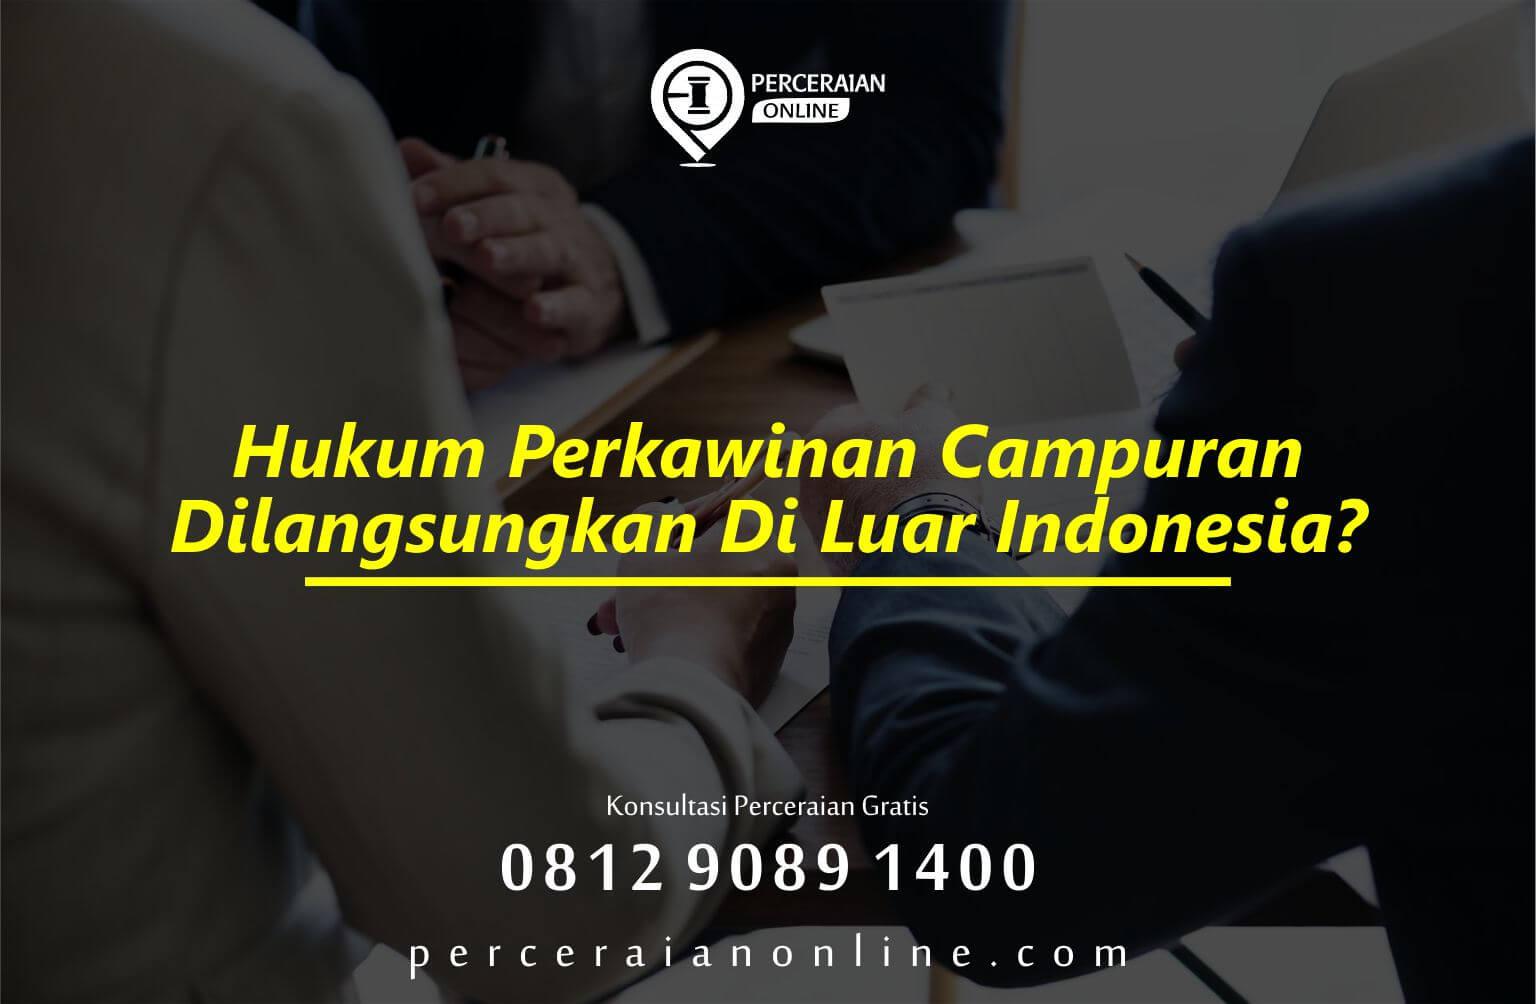 Hukum Perkawinan Campuran Dilangsungkan Di Luar Indonesia